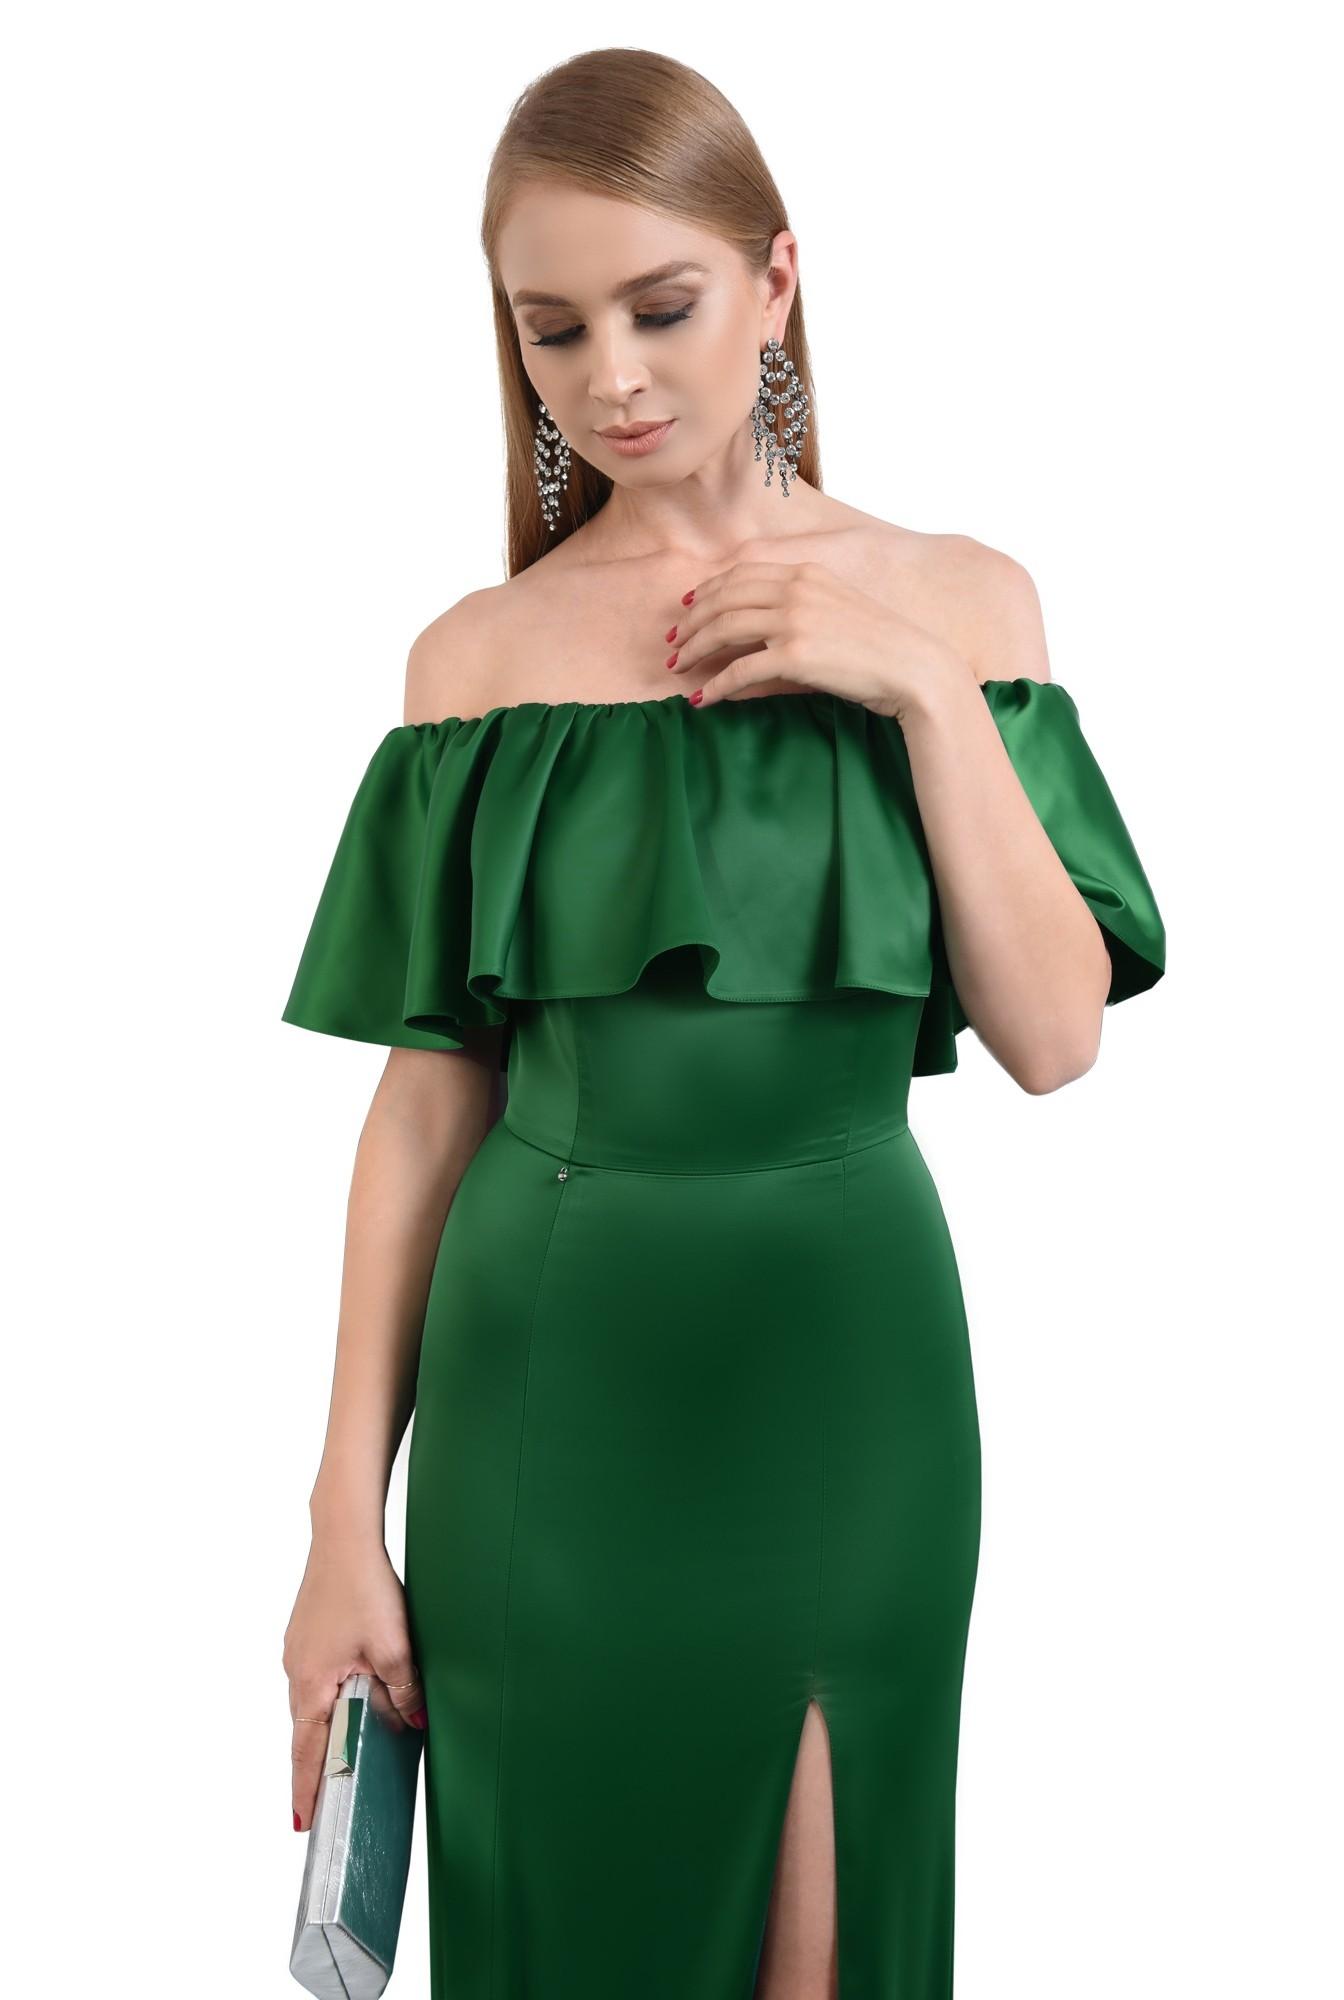 3 - rochie de seara smarald, slit adanc, umeri dezgoliti, maxi